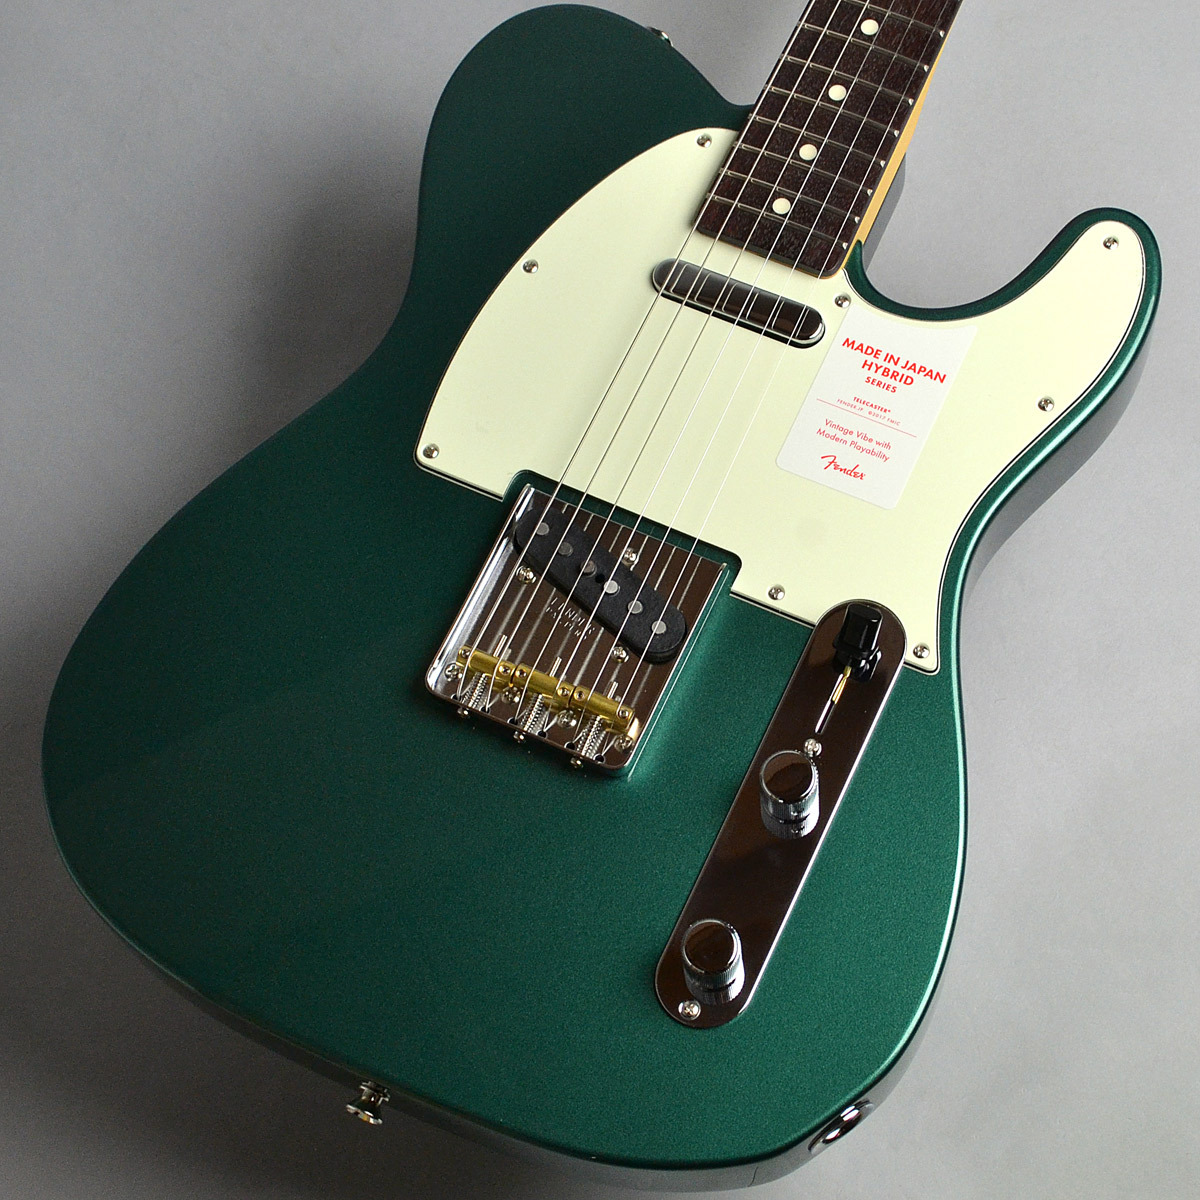 Fender Made in Japan Hybrid 60s Telecaster/Sherwood Green Metallic エレキギター 【フェンダー】【新宿PePe店】